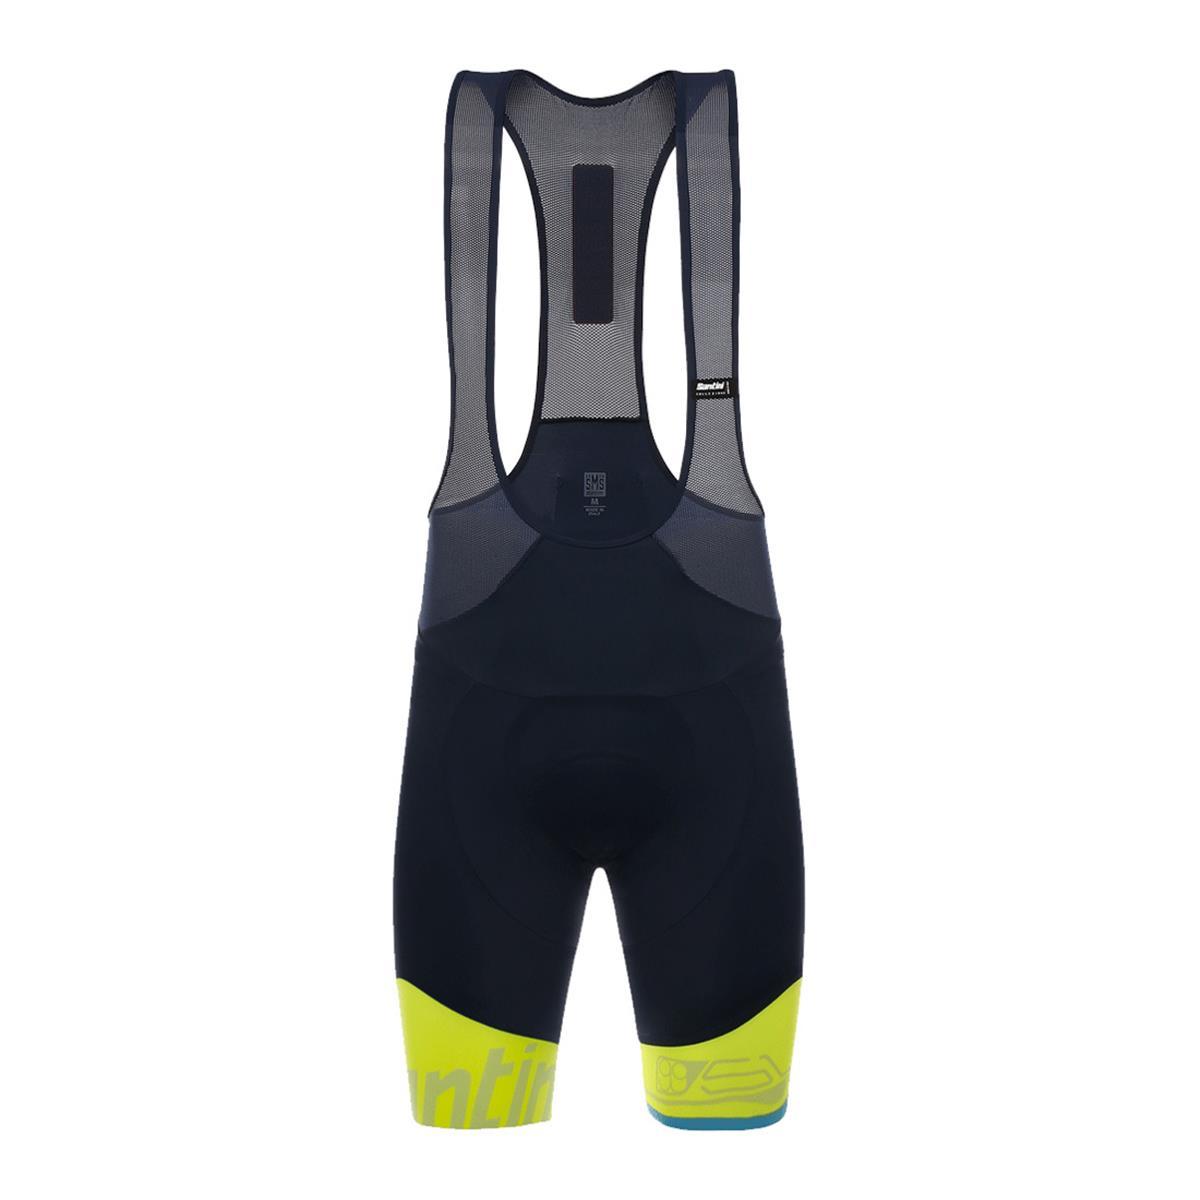 b8a4fb993 Santini Sleek 99 Mens Bib Shorts (Yellow)